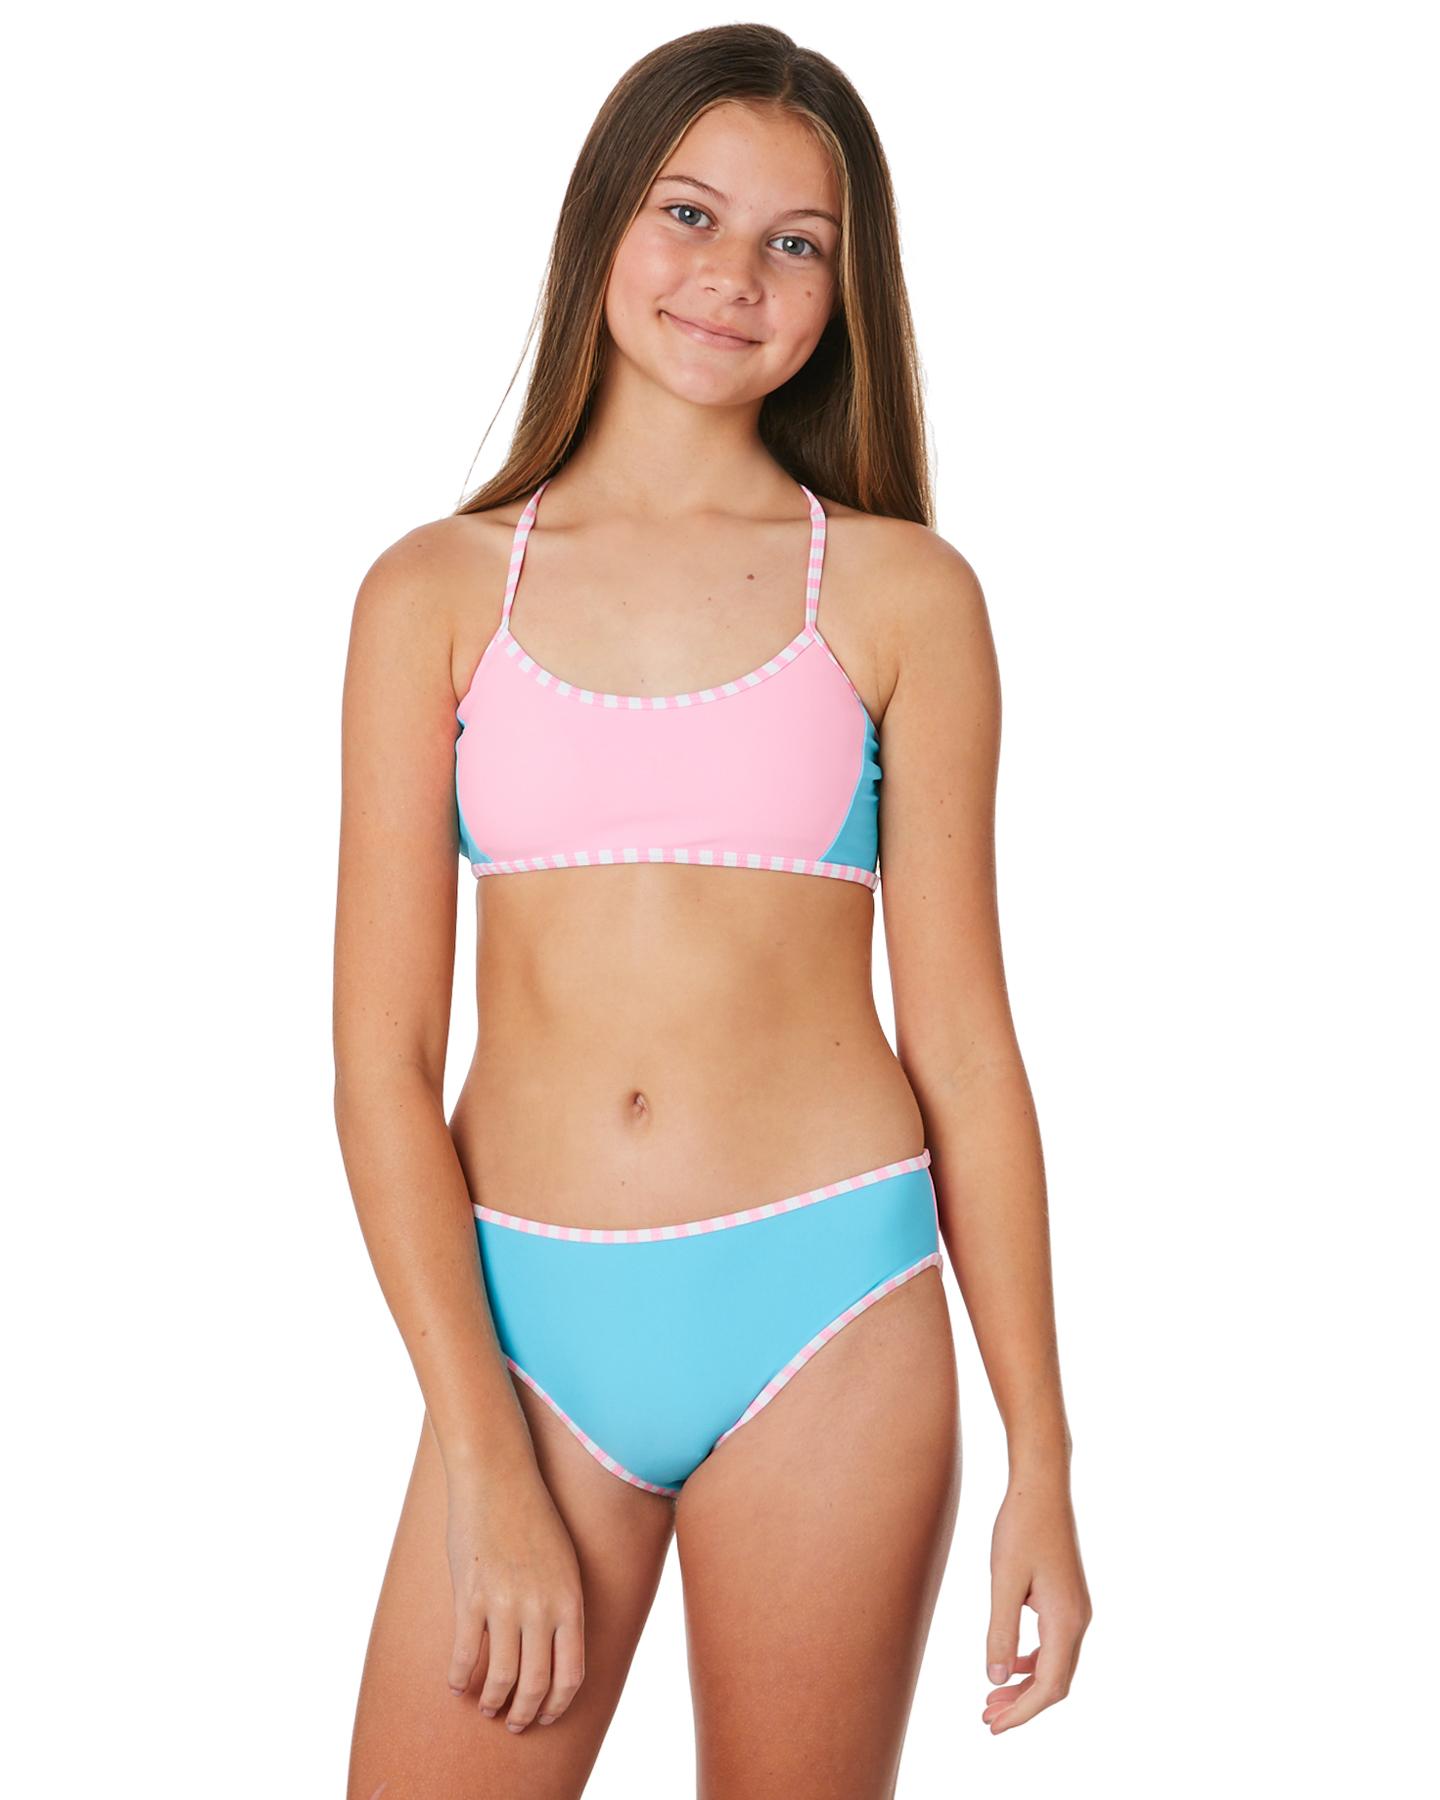 Eliza dushku the new guy bikini